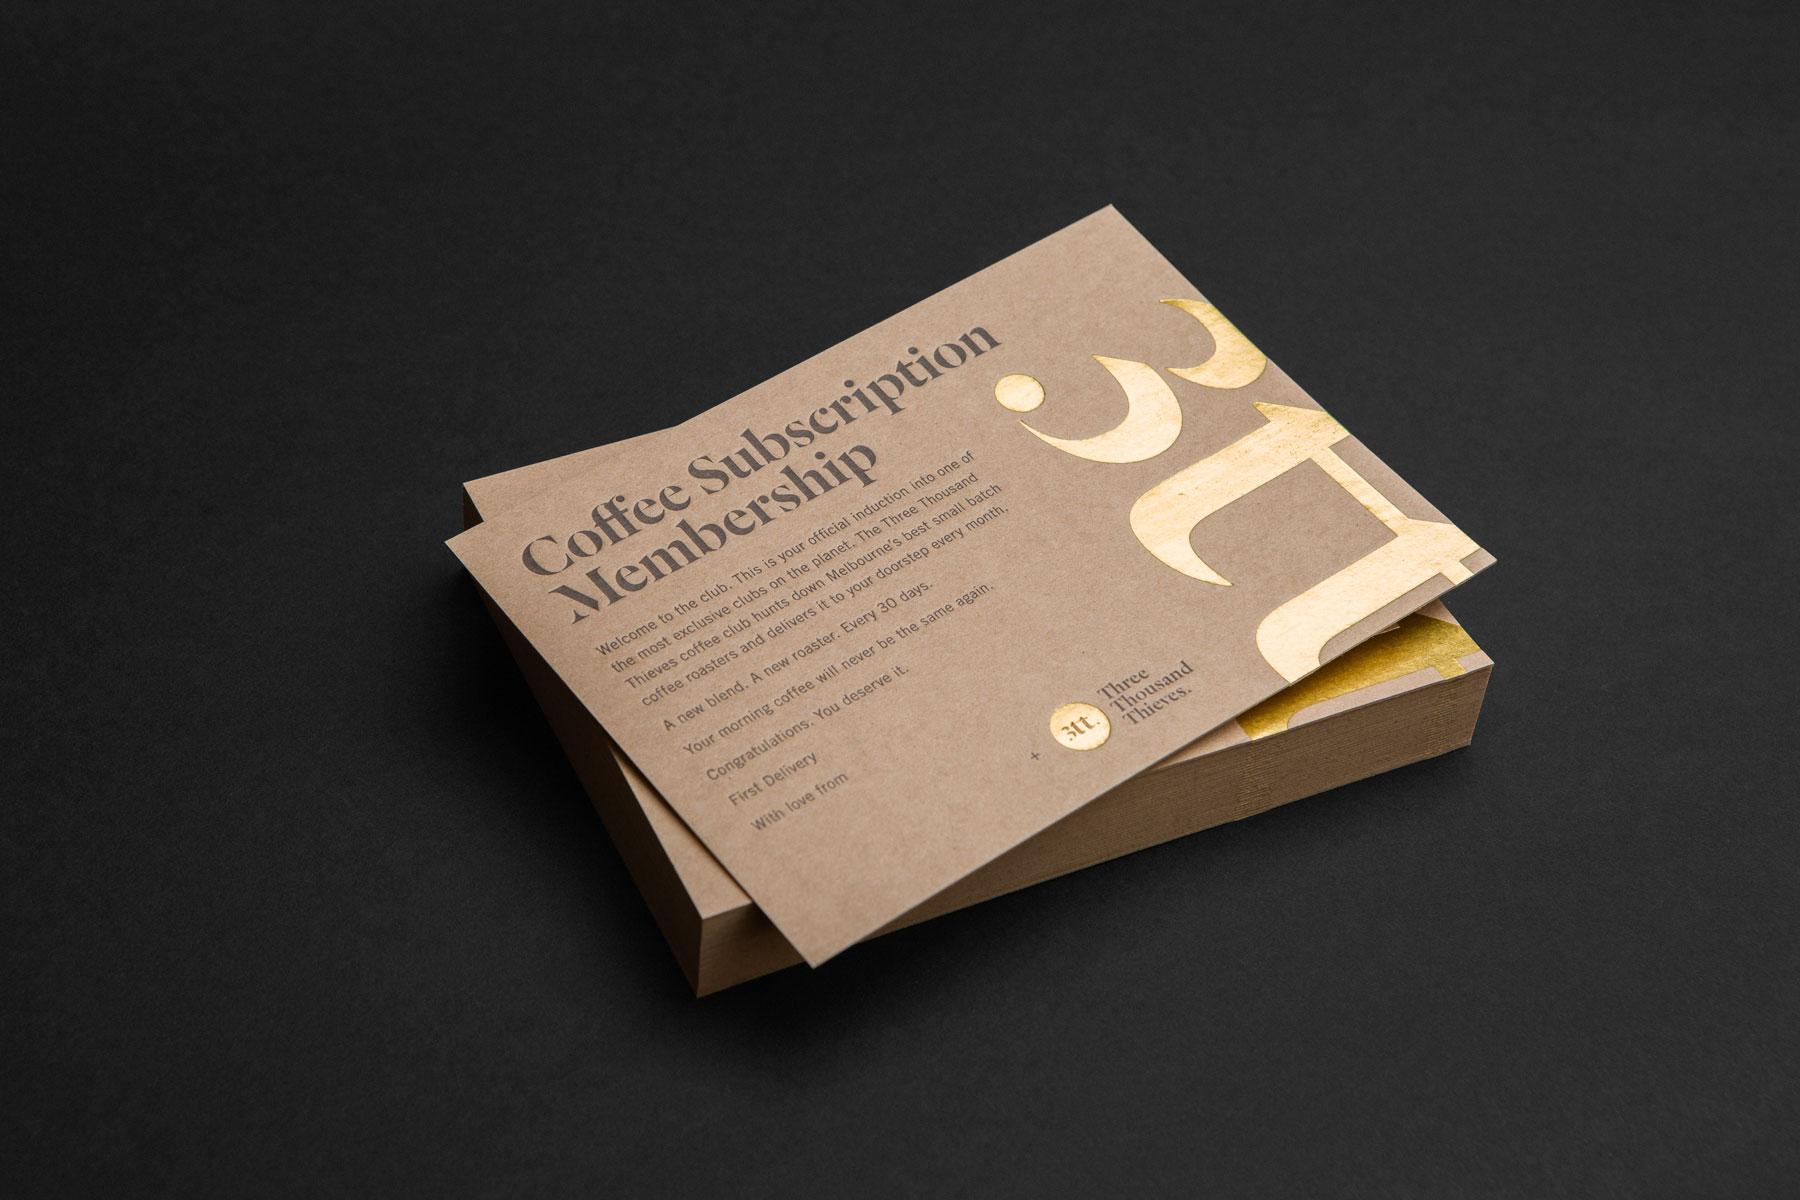 3TT-Box.card_